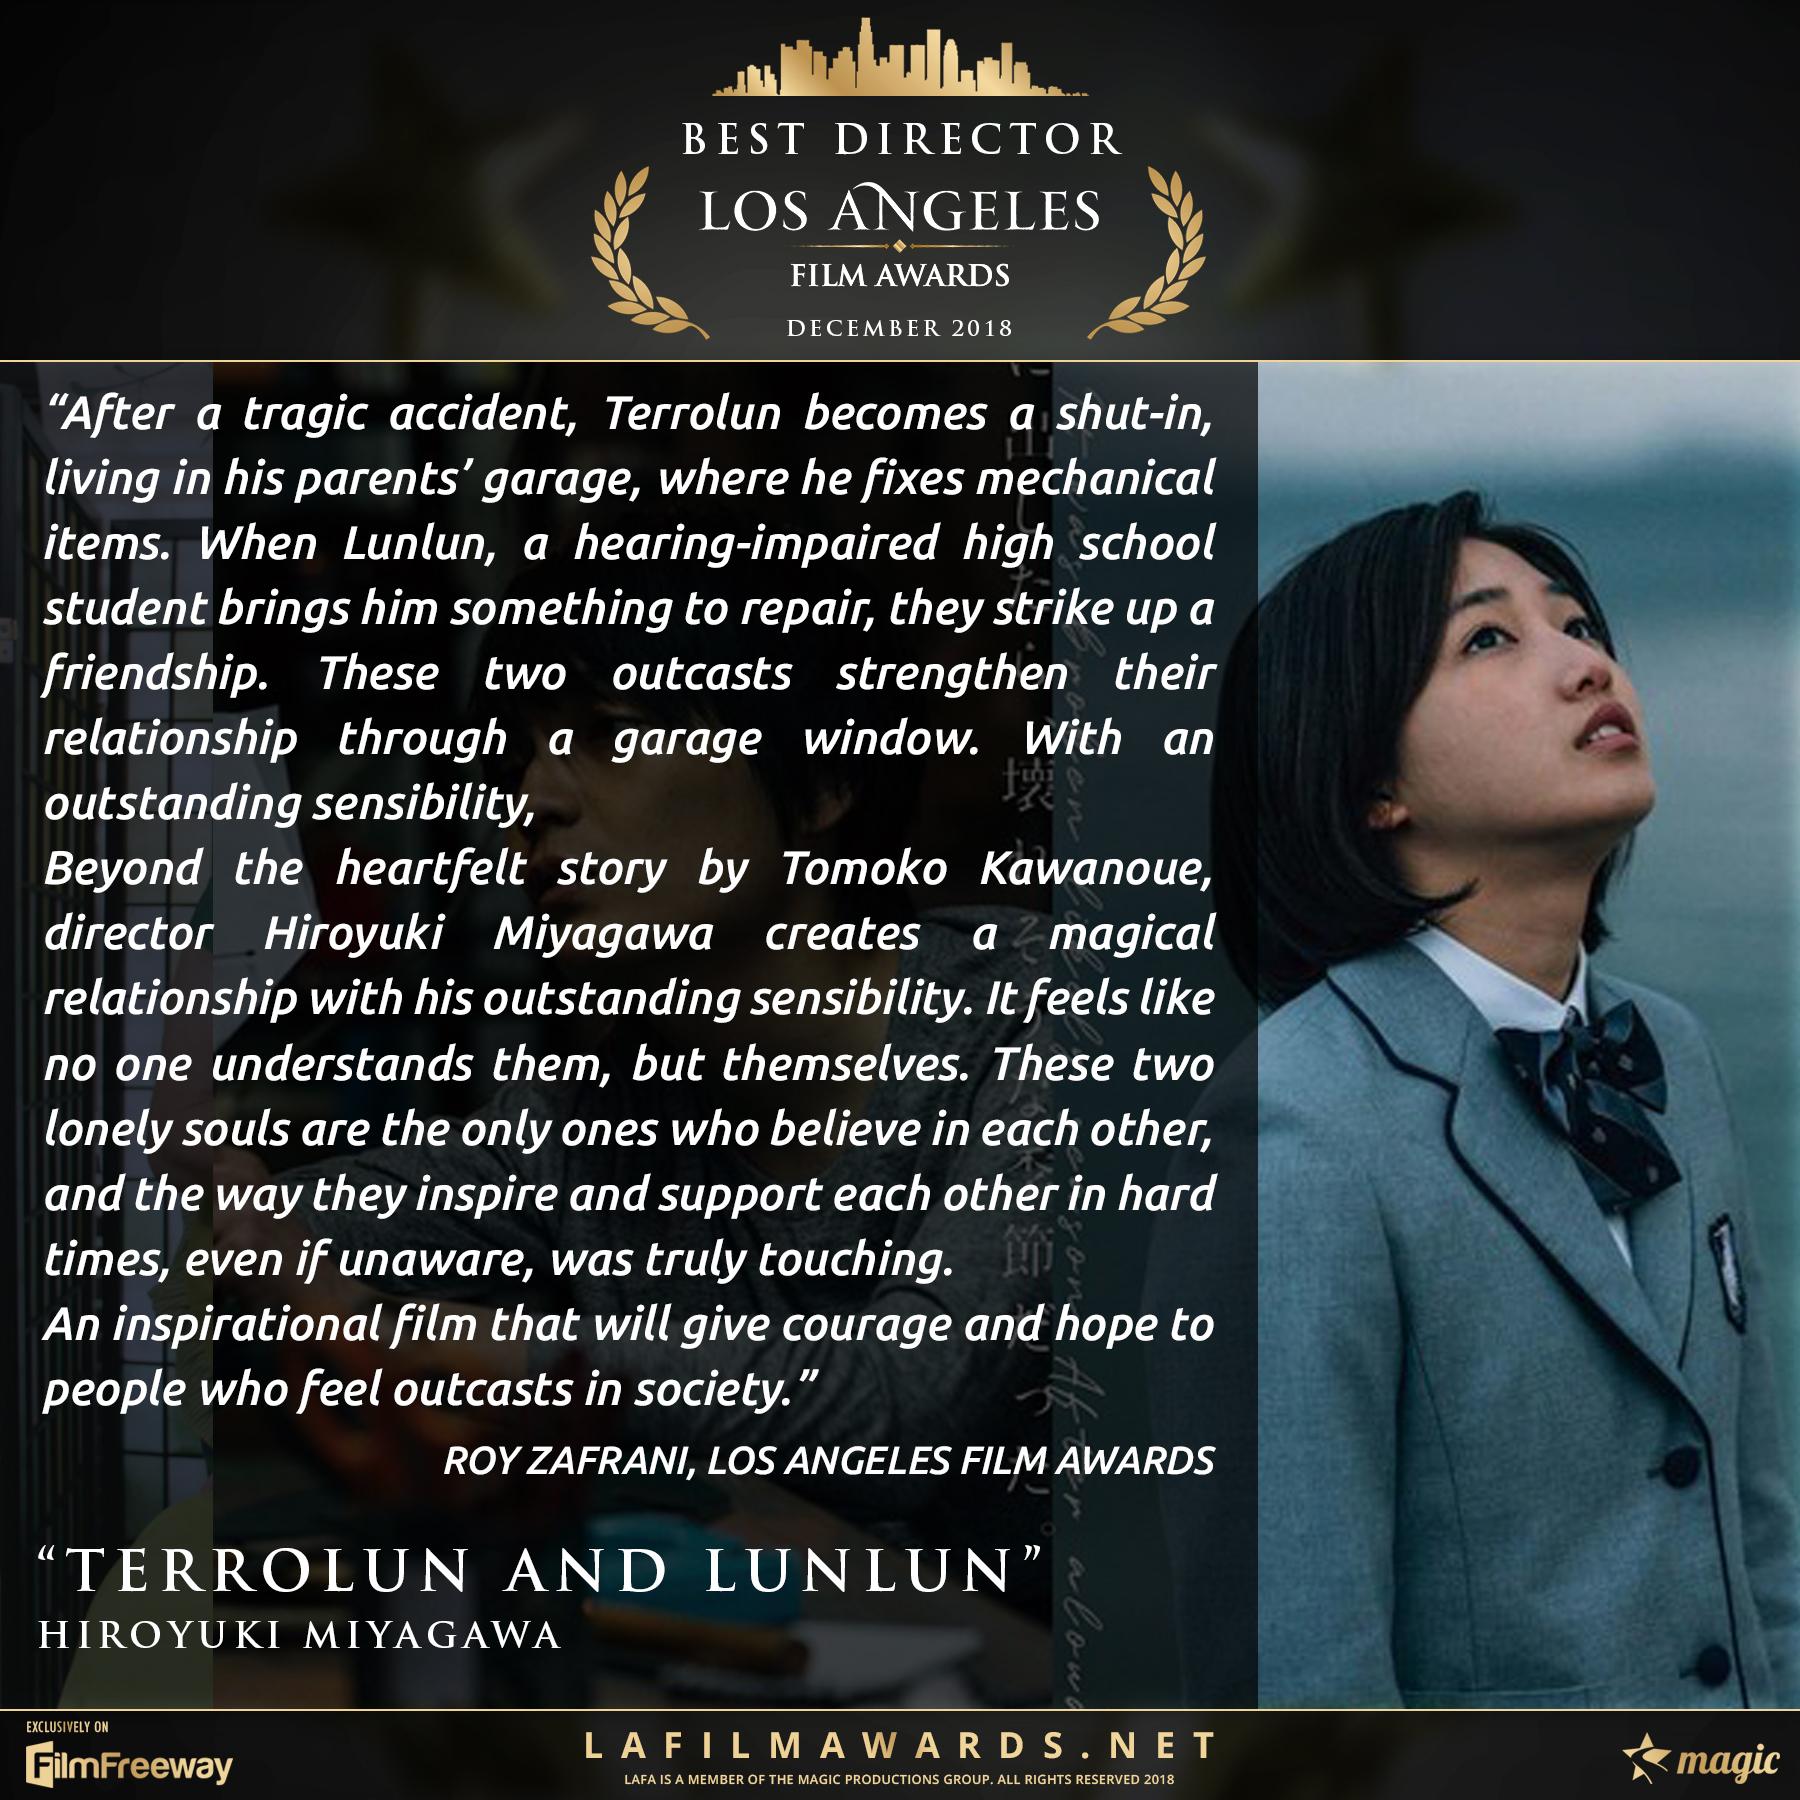 terrolun and lunlun - Review